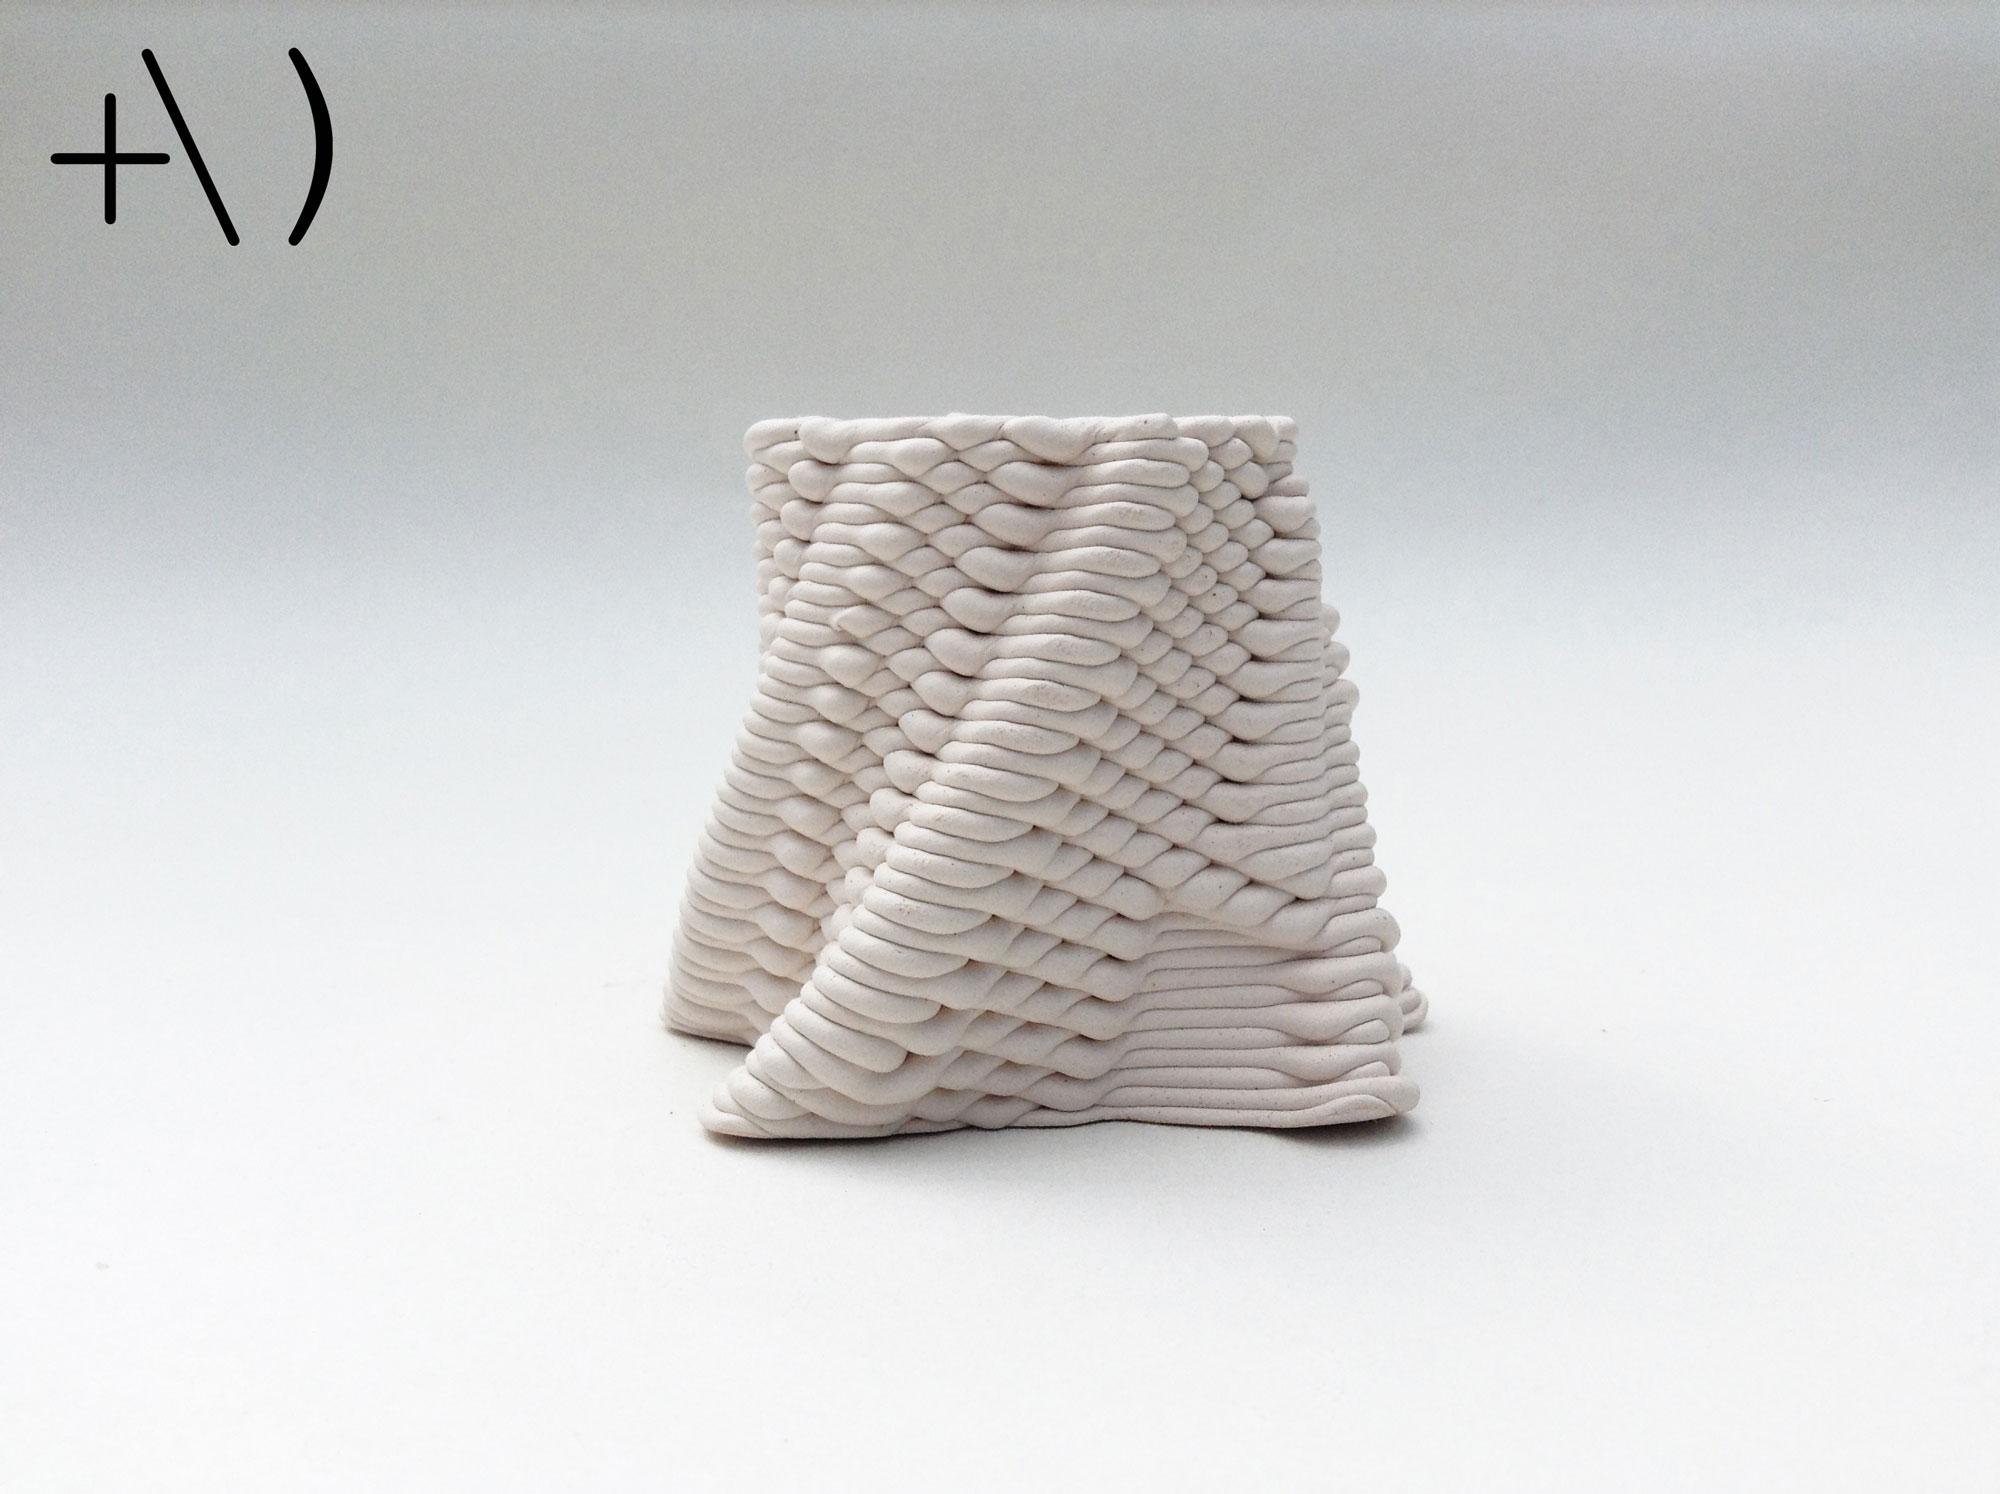 computational clay design super formula onde laterale